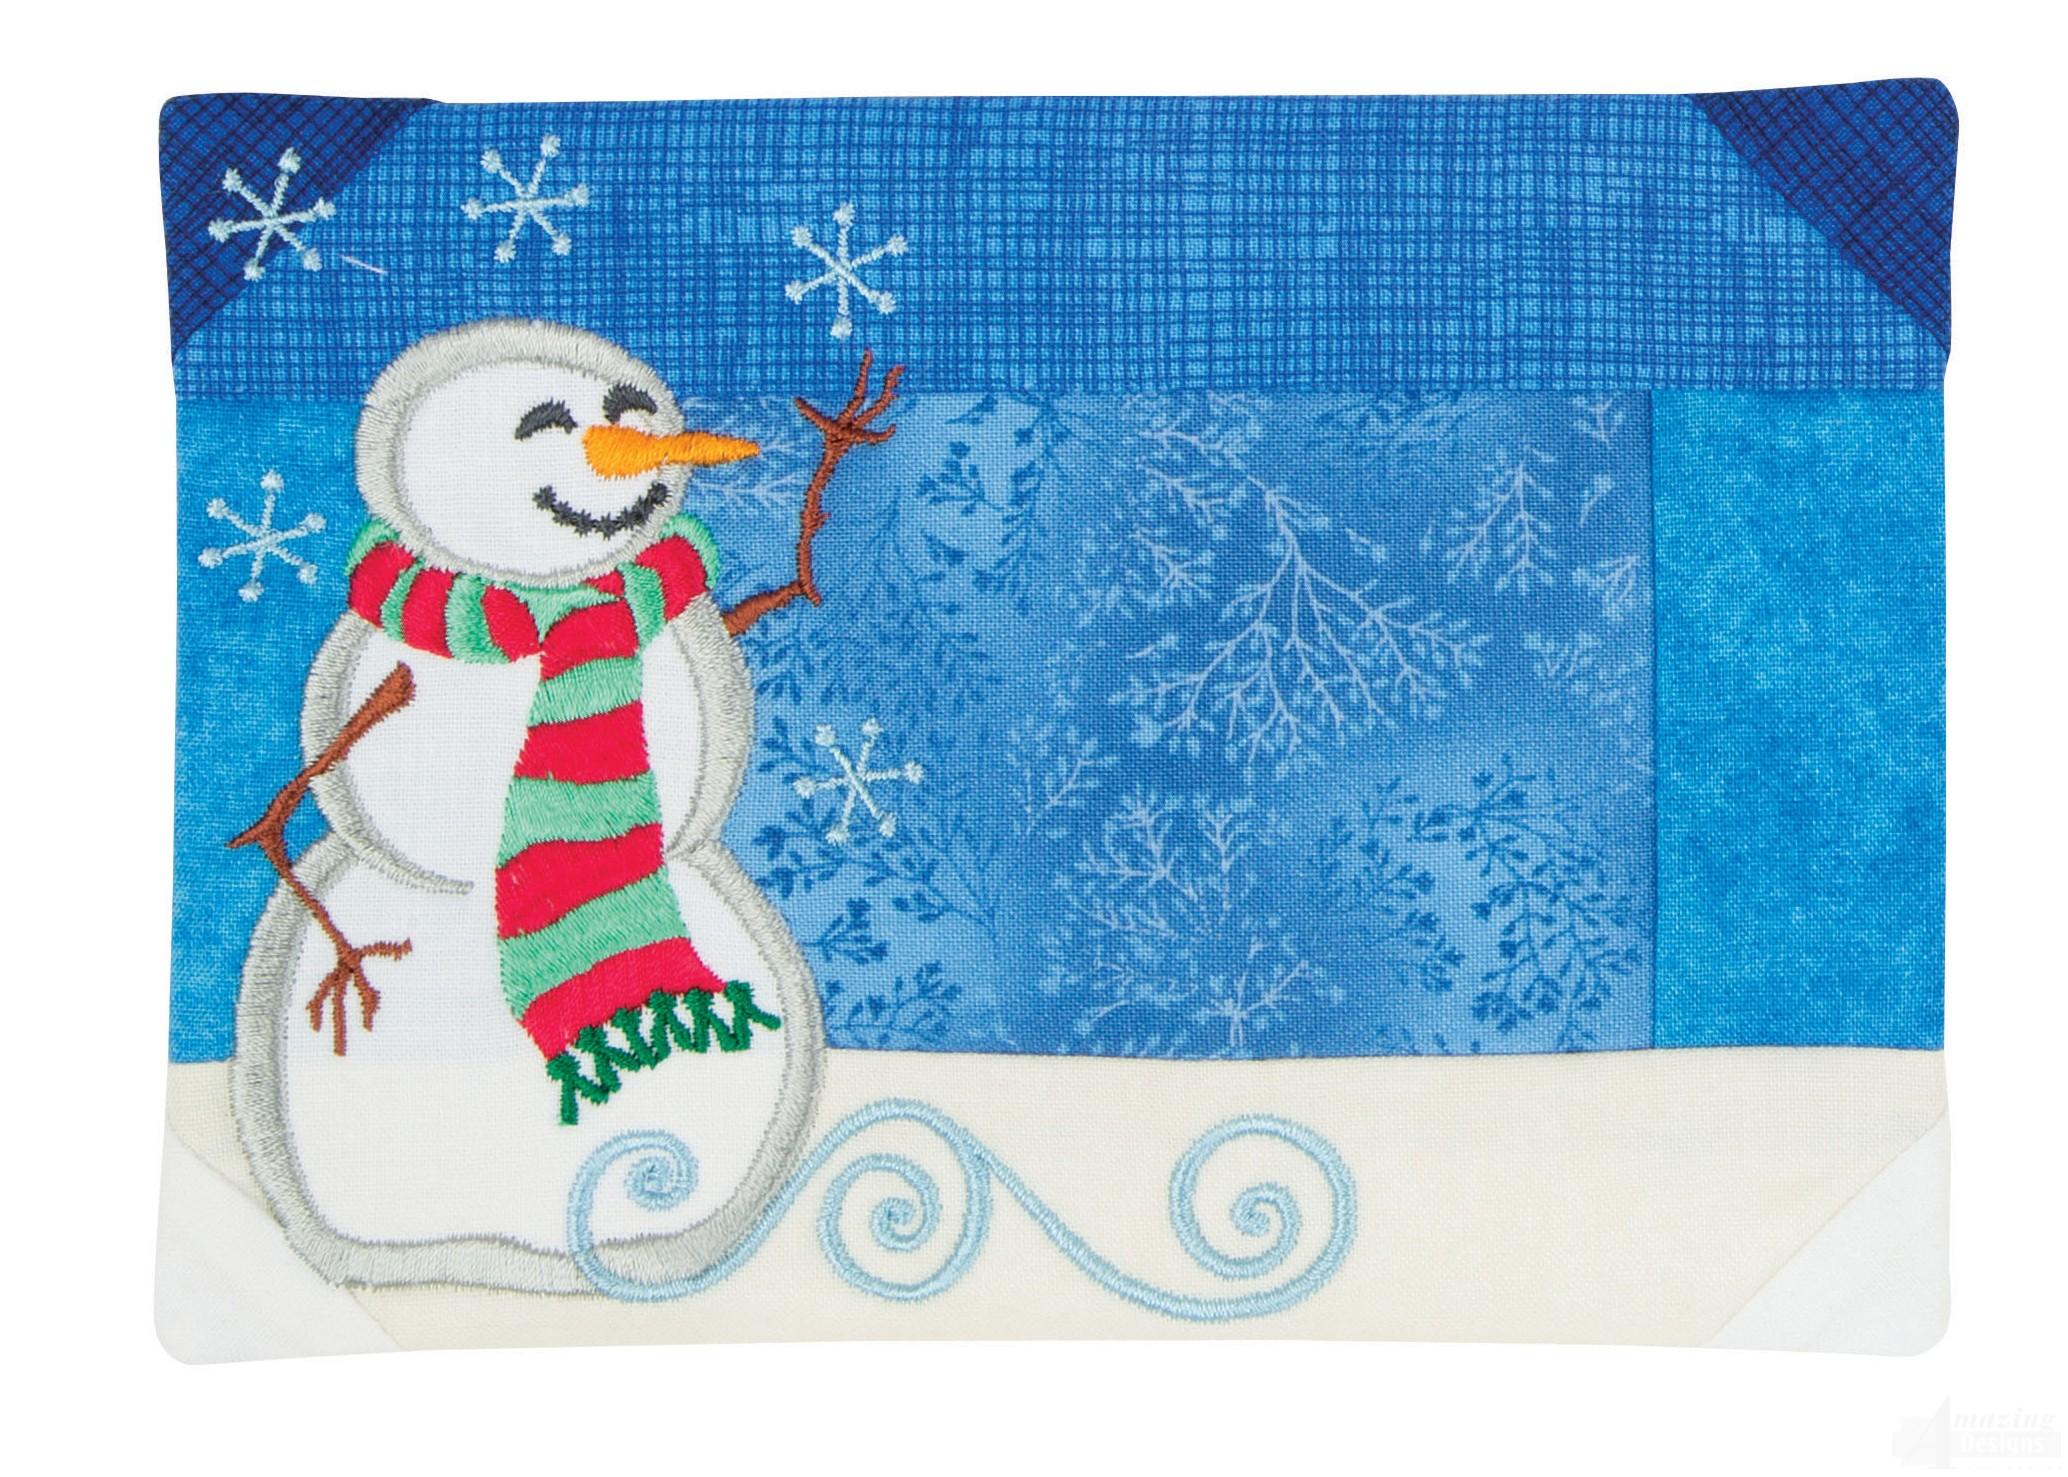 Pieced mug rug and snowman embroidery design